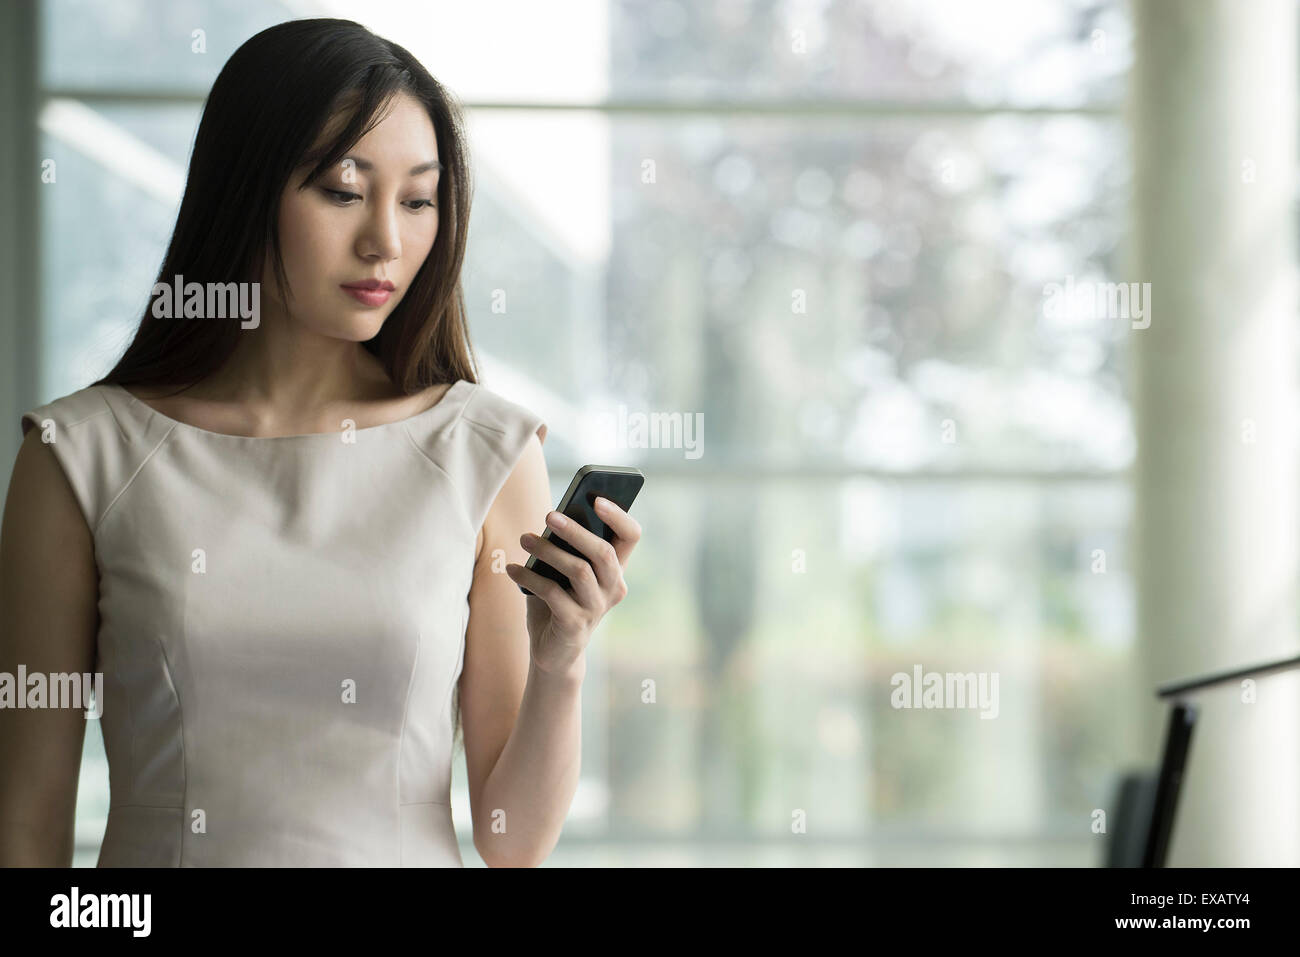 d4655f864b4 Informal Attire Stock Photos   Informal Attire Stock Images - Alamy